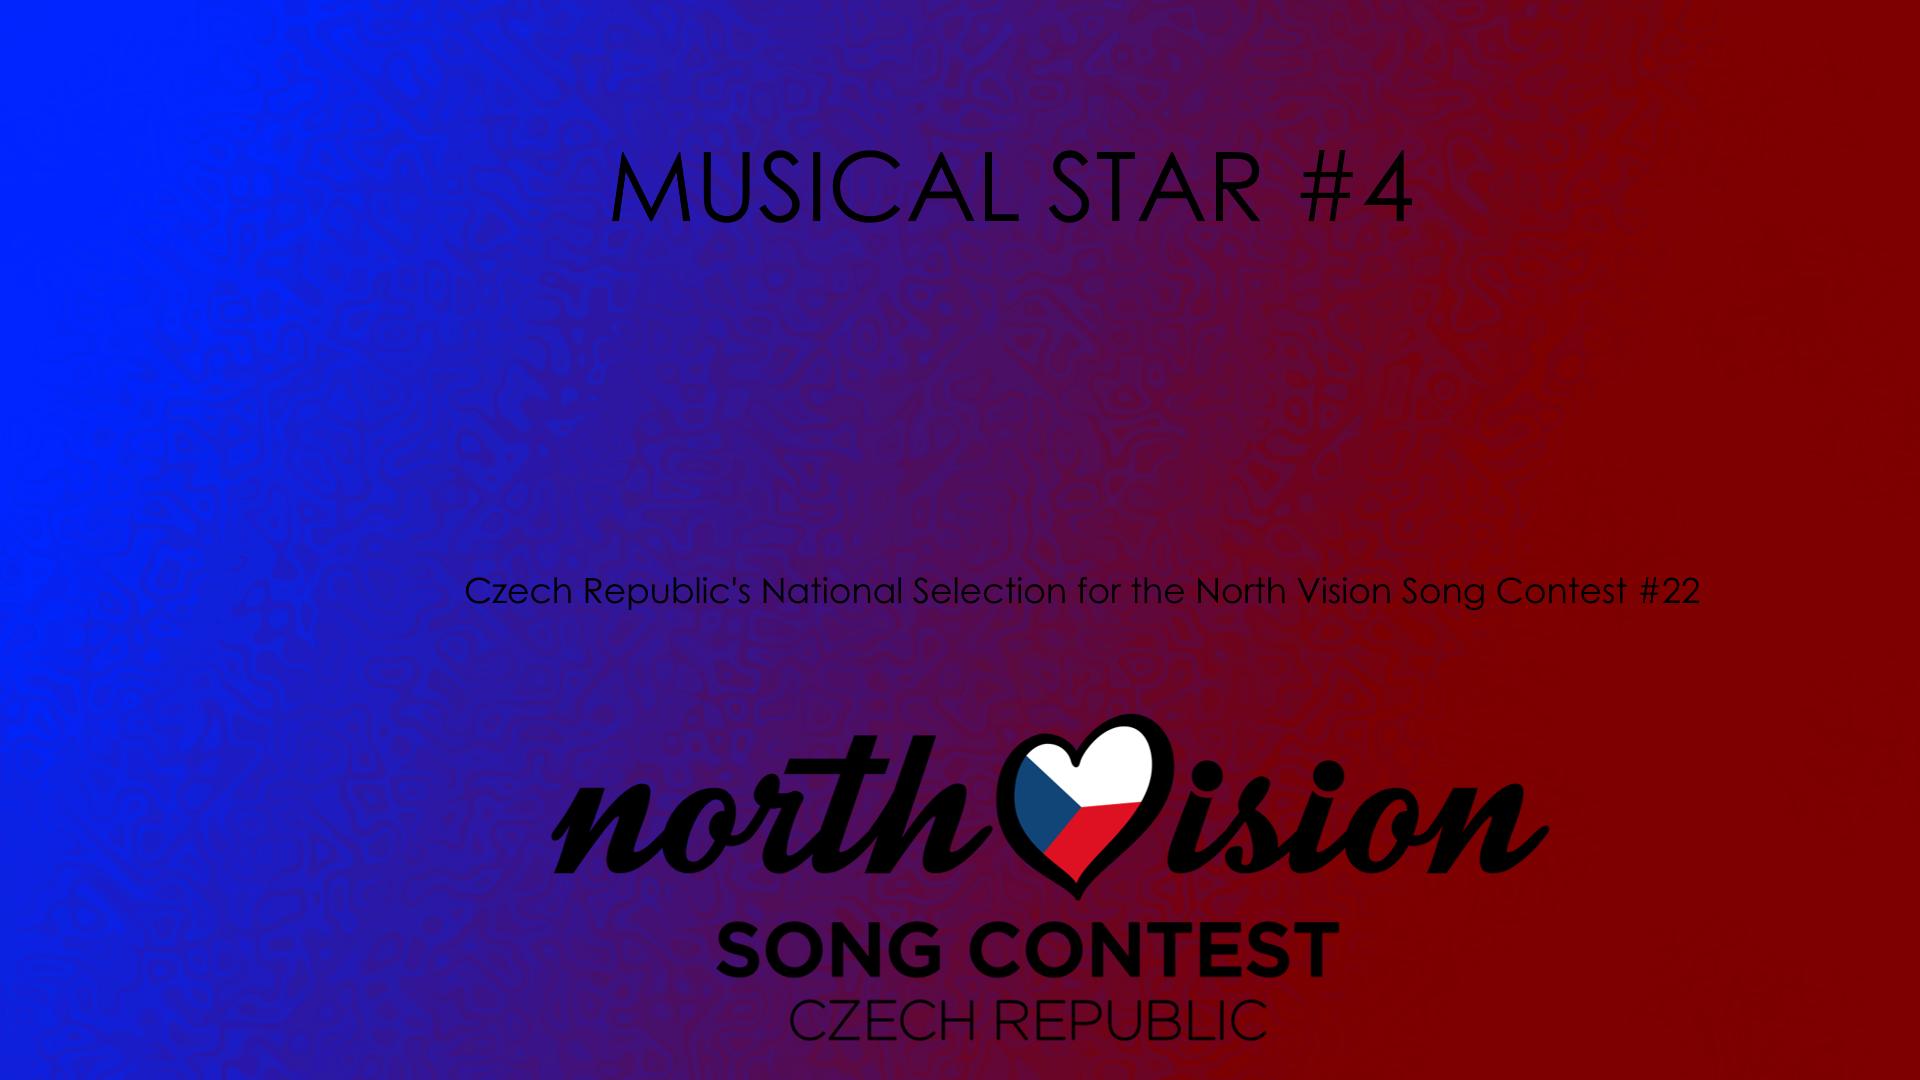 Musical Star 4